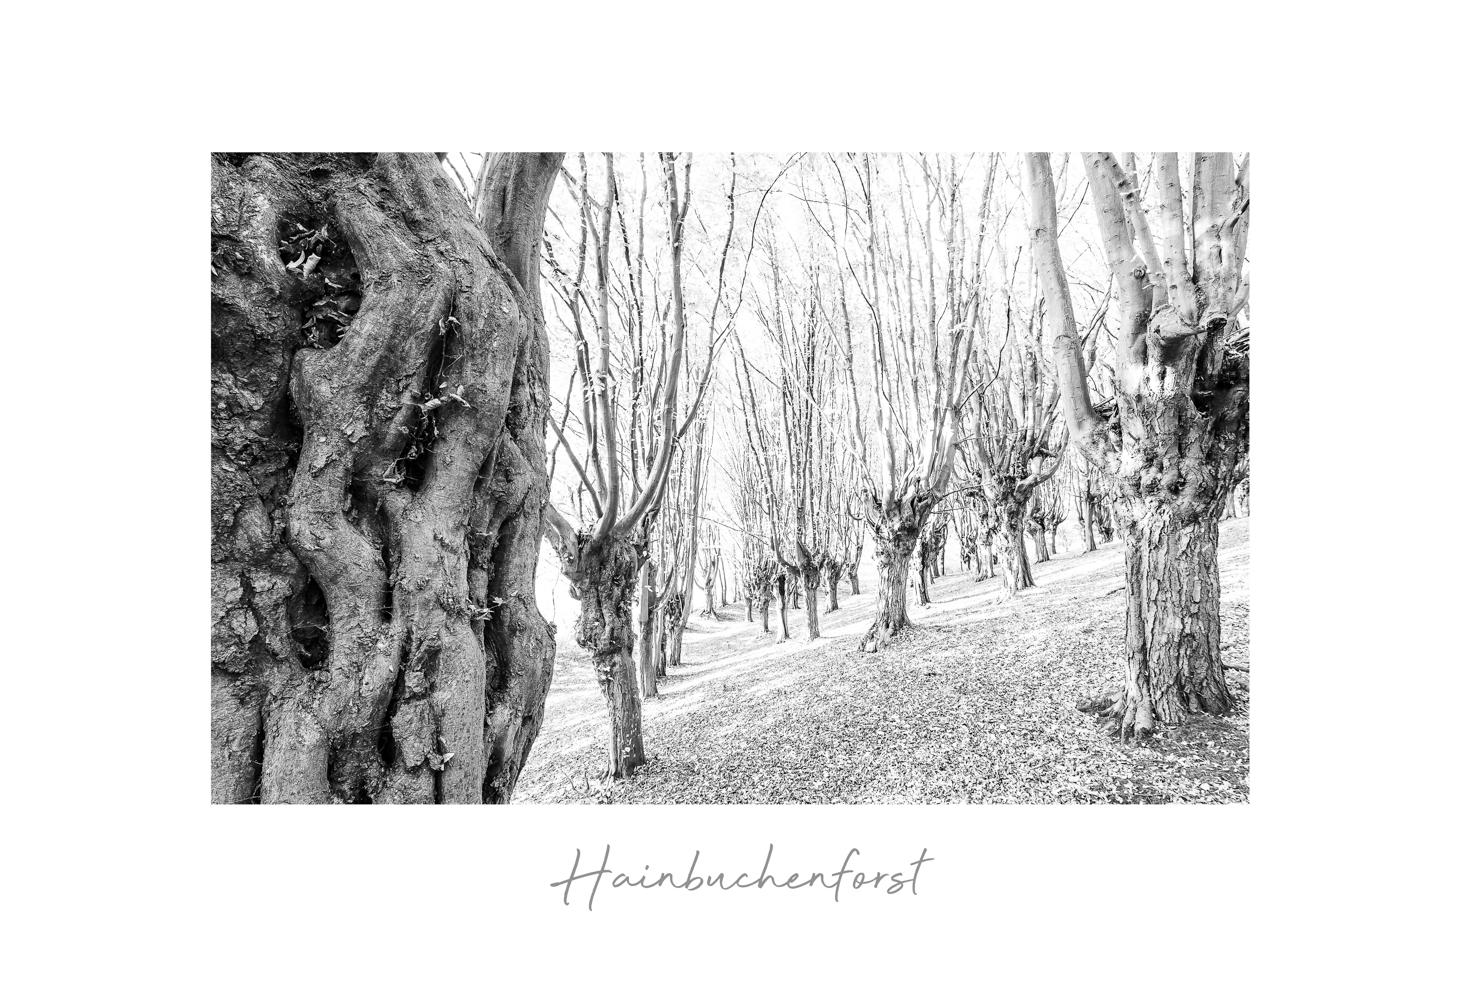 hainbuchenhorst-3-1